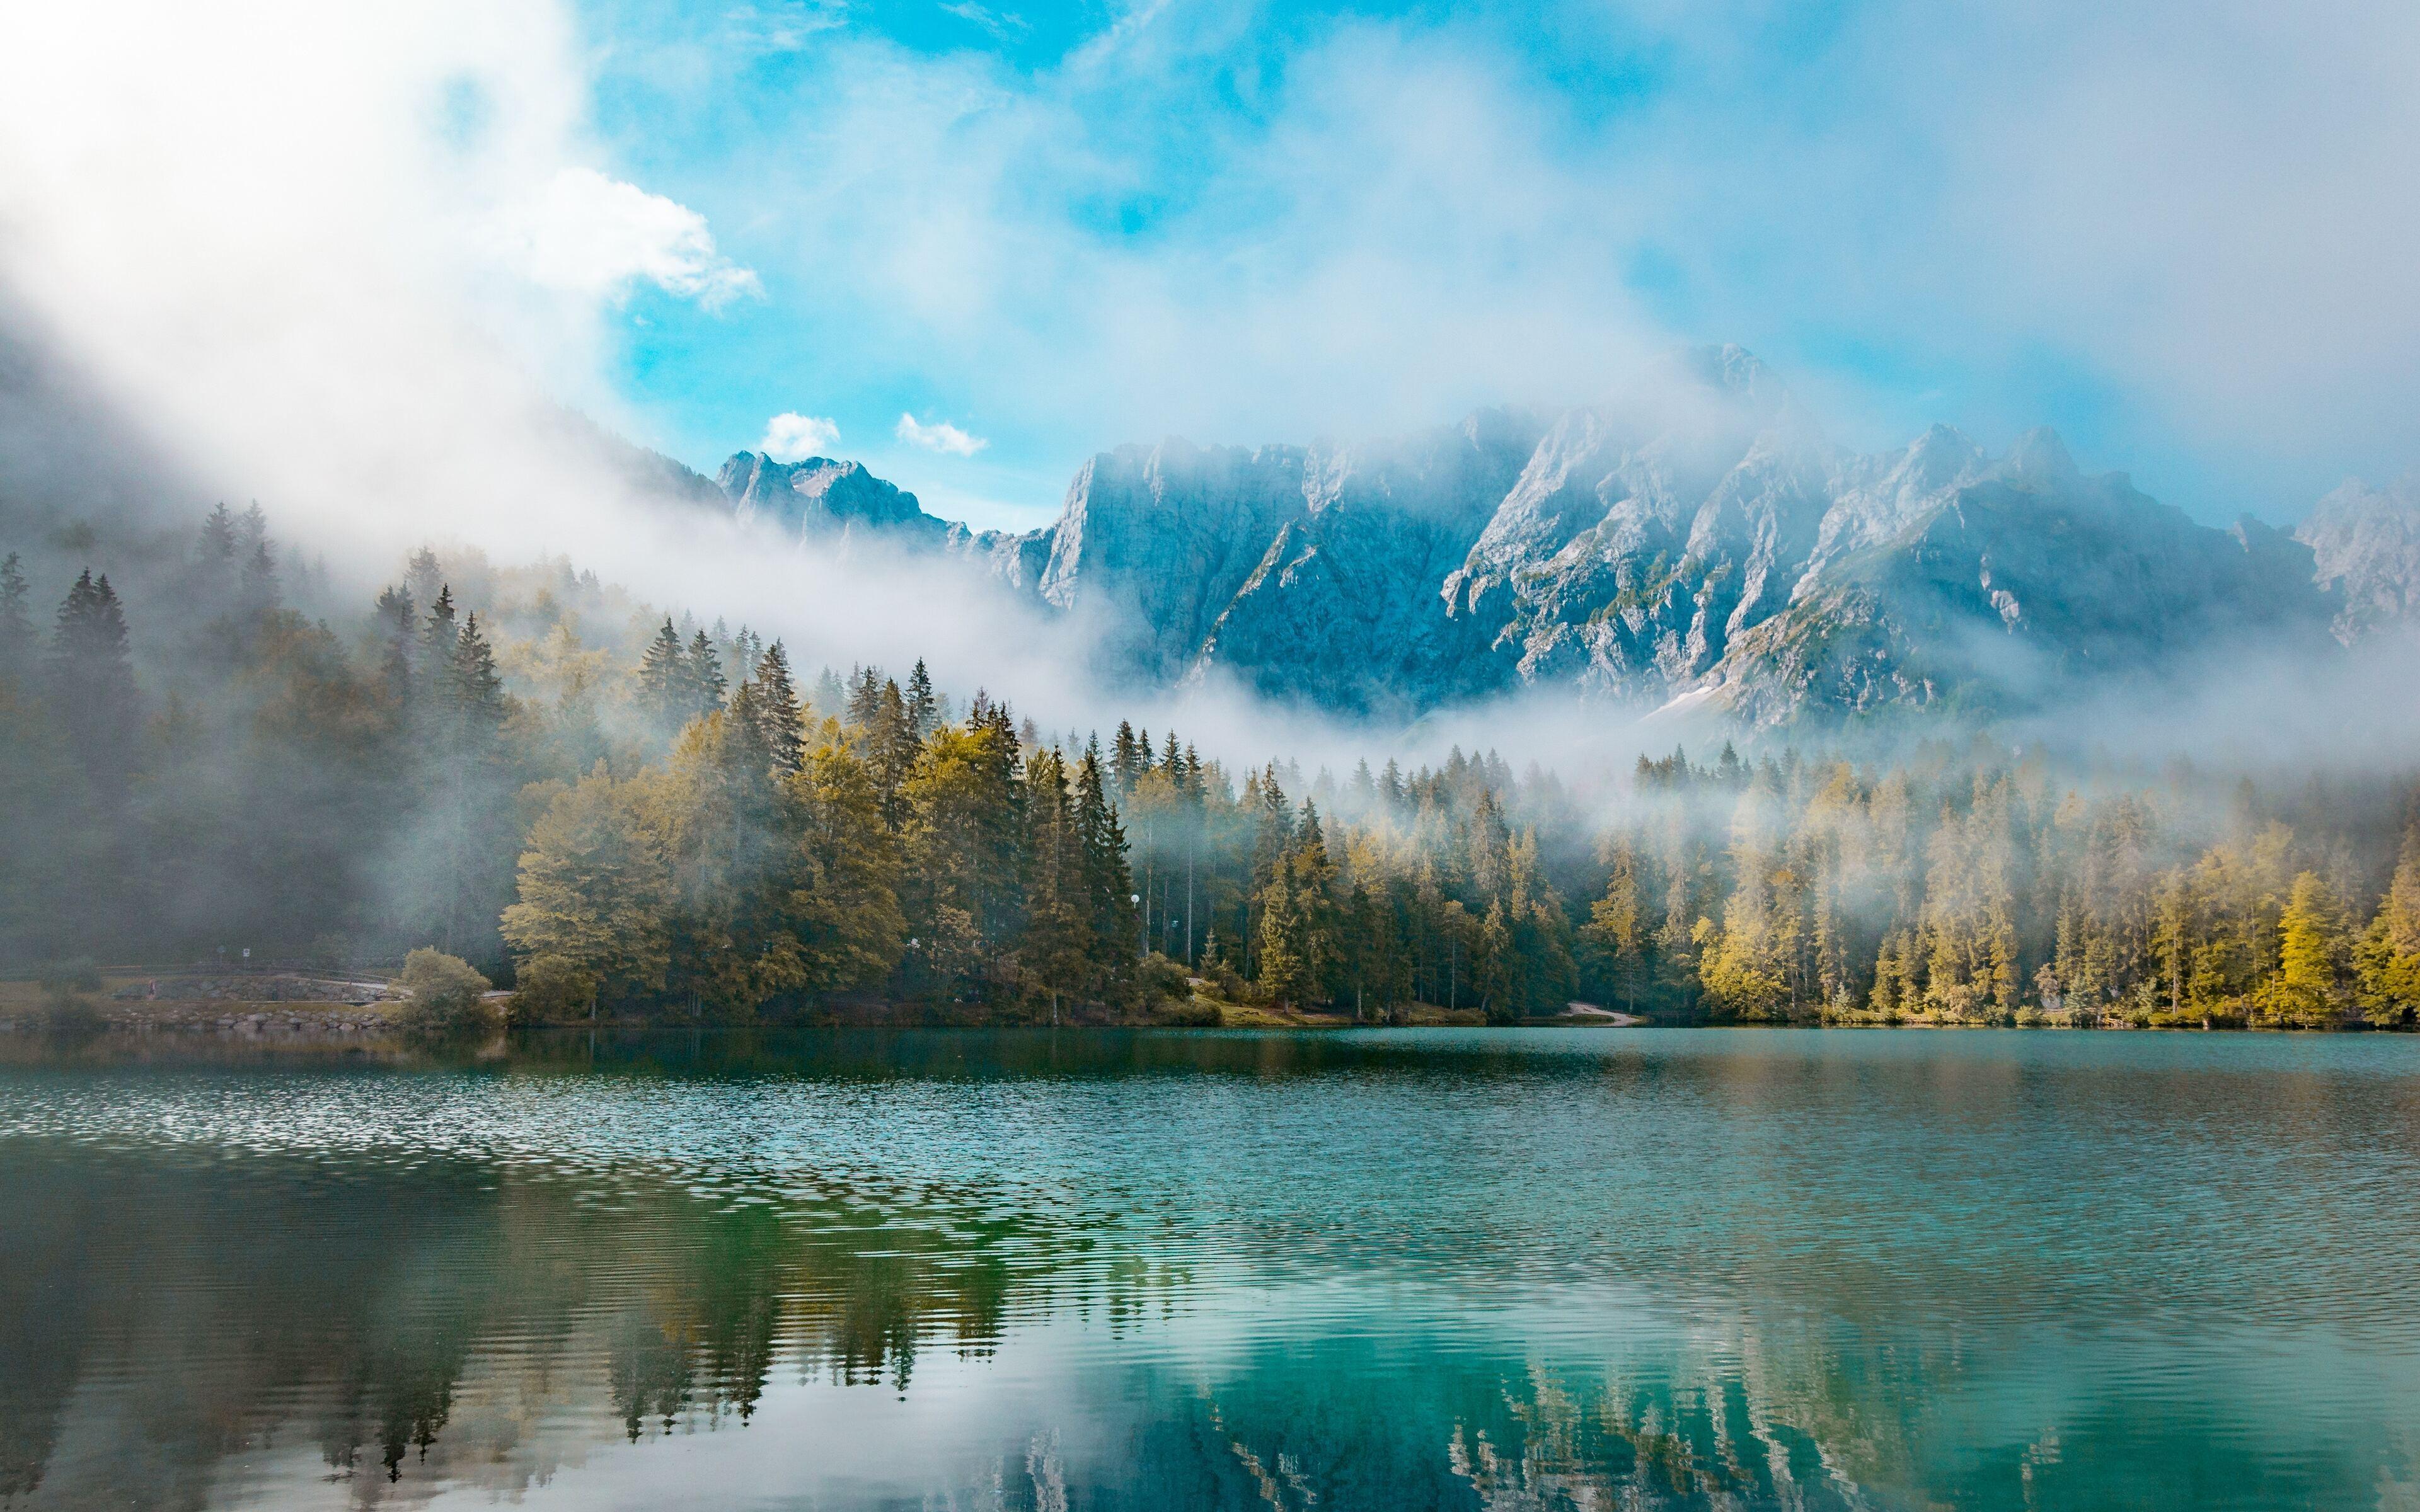 3840x2400 Landscape Itlay Forest Mist Mountains 4k 4k HD ...